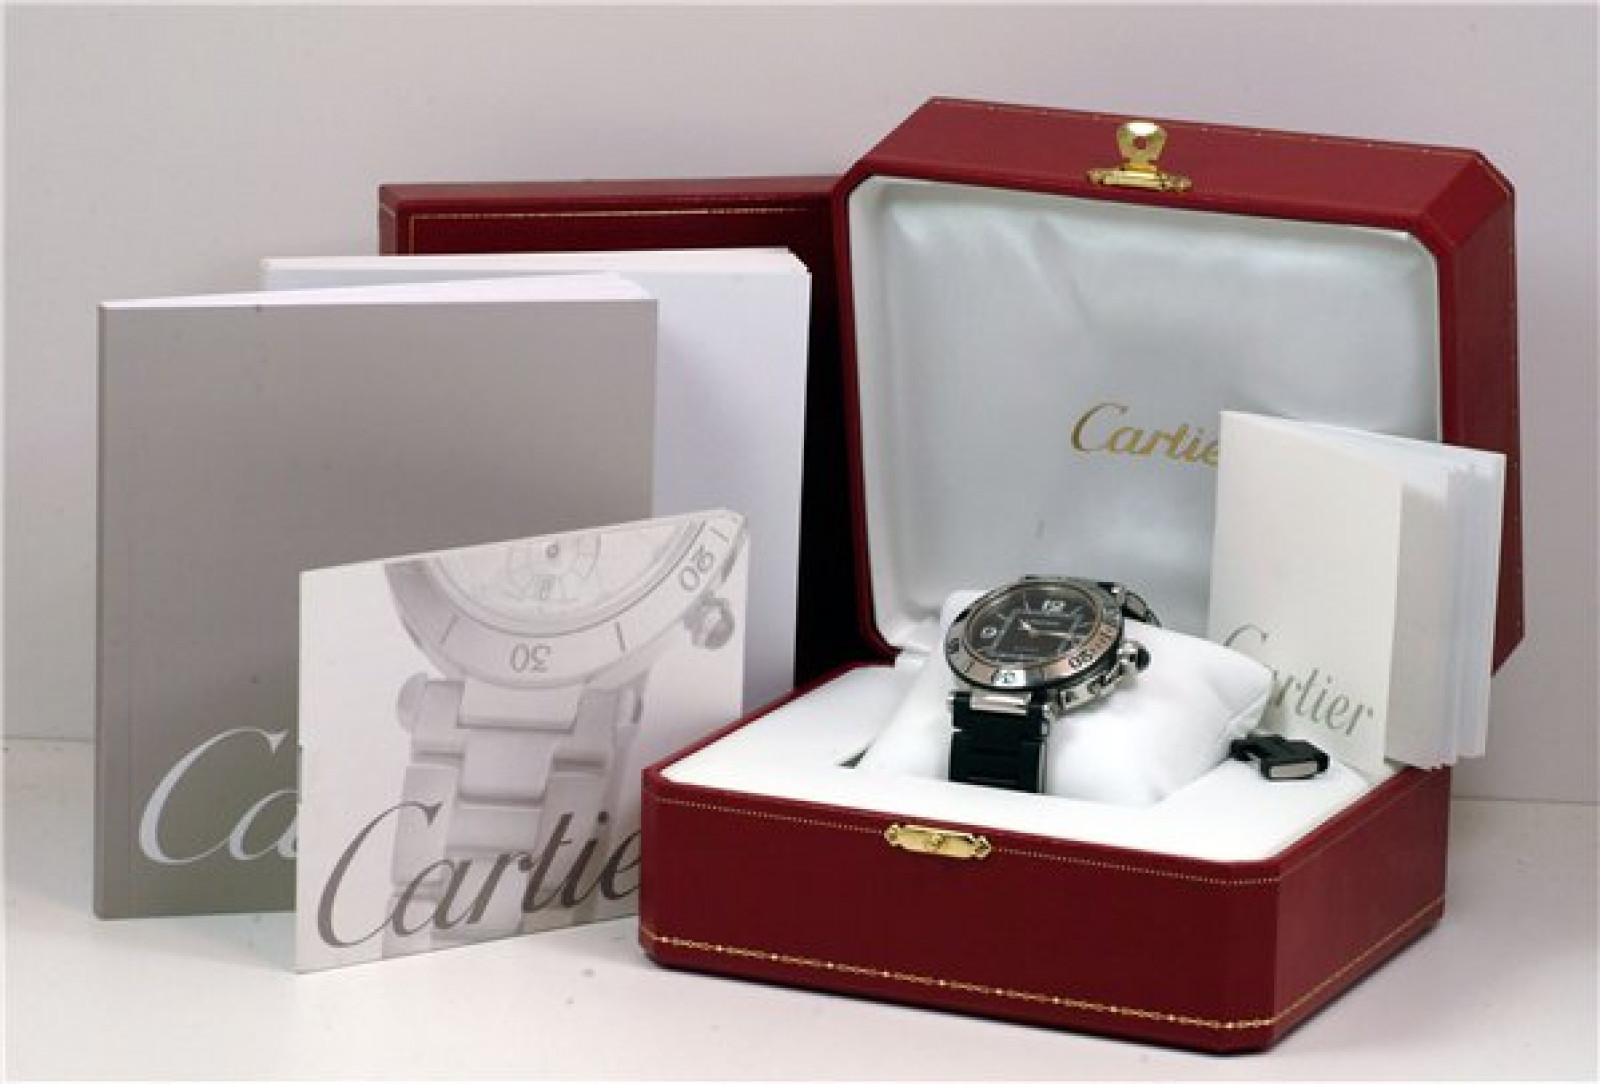 Black Diamond Dial Cartier Pasha W31077U2